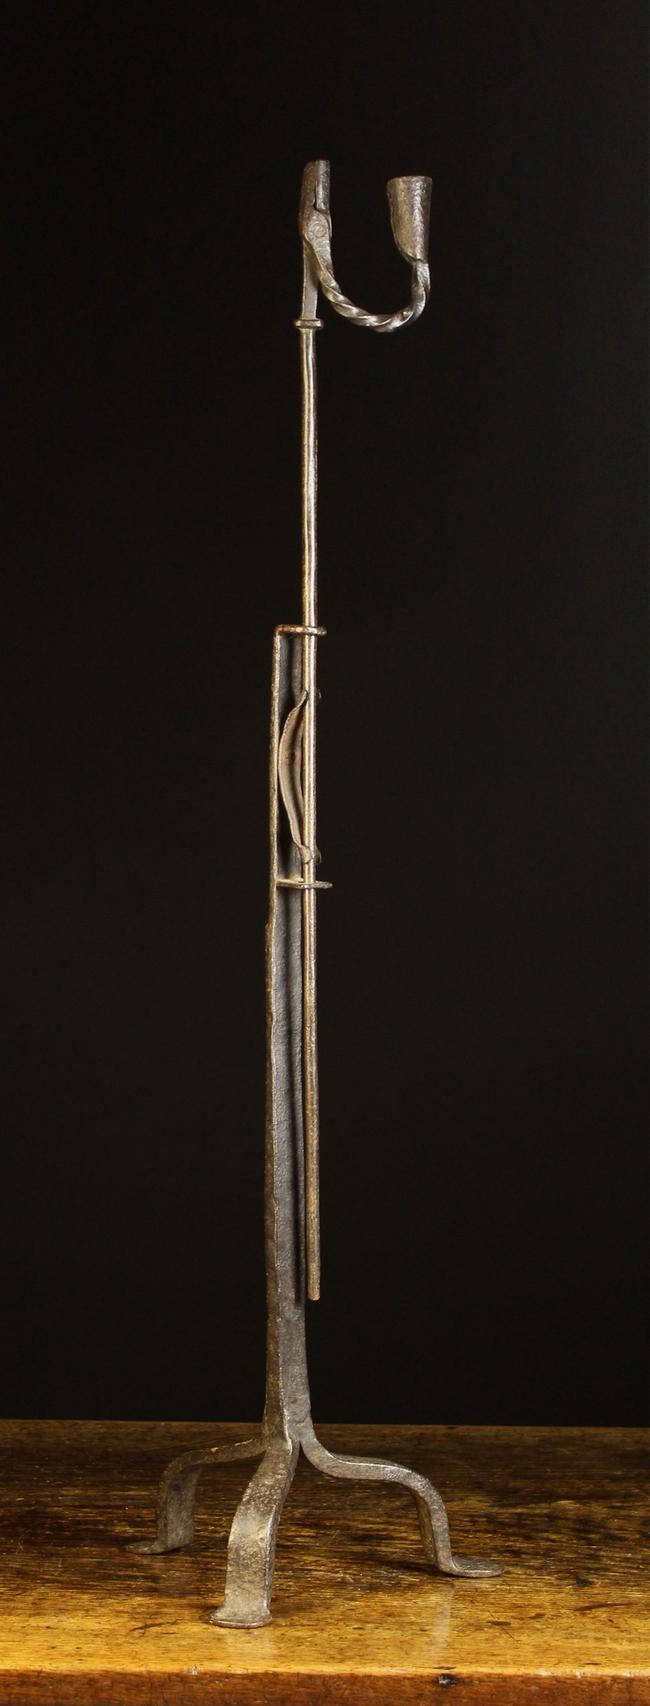 Lot 49 - An 18th Century Wrought Iron Corner Standard Rushnip / Candleholder.